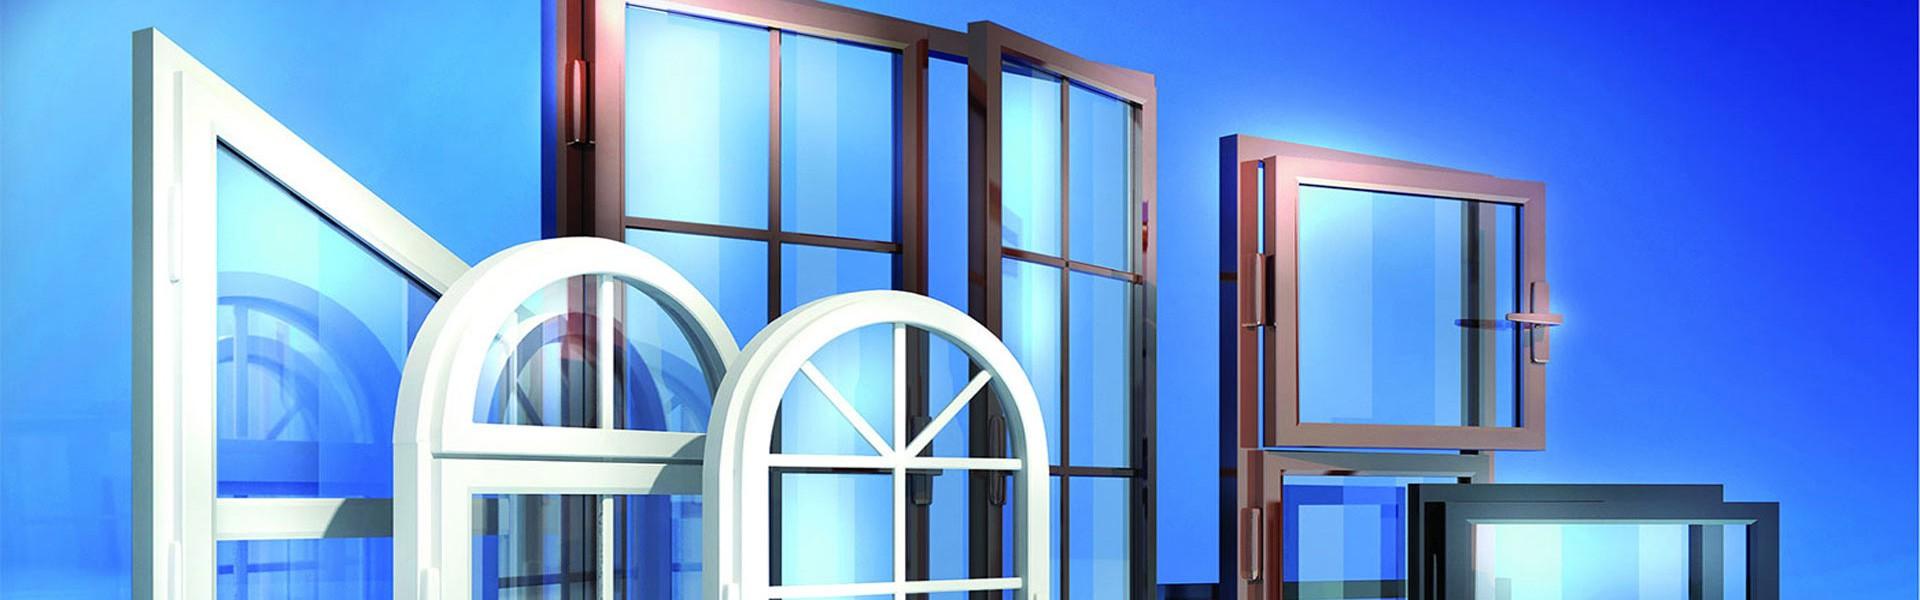 Aluminyum ve Plastik Pencere sistemleri